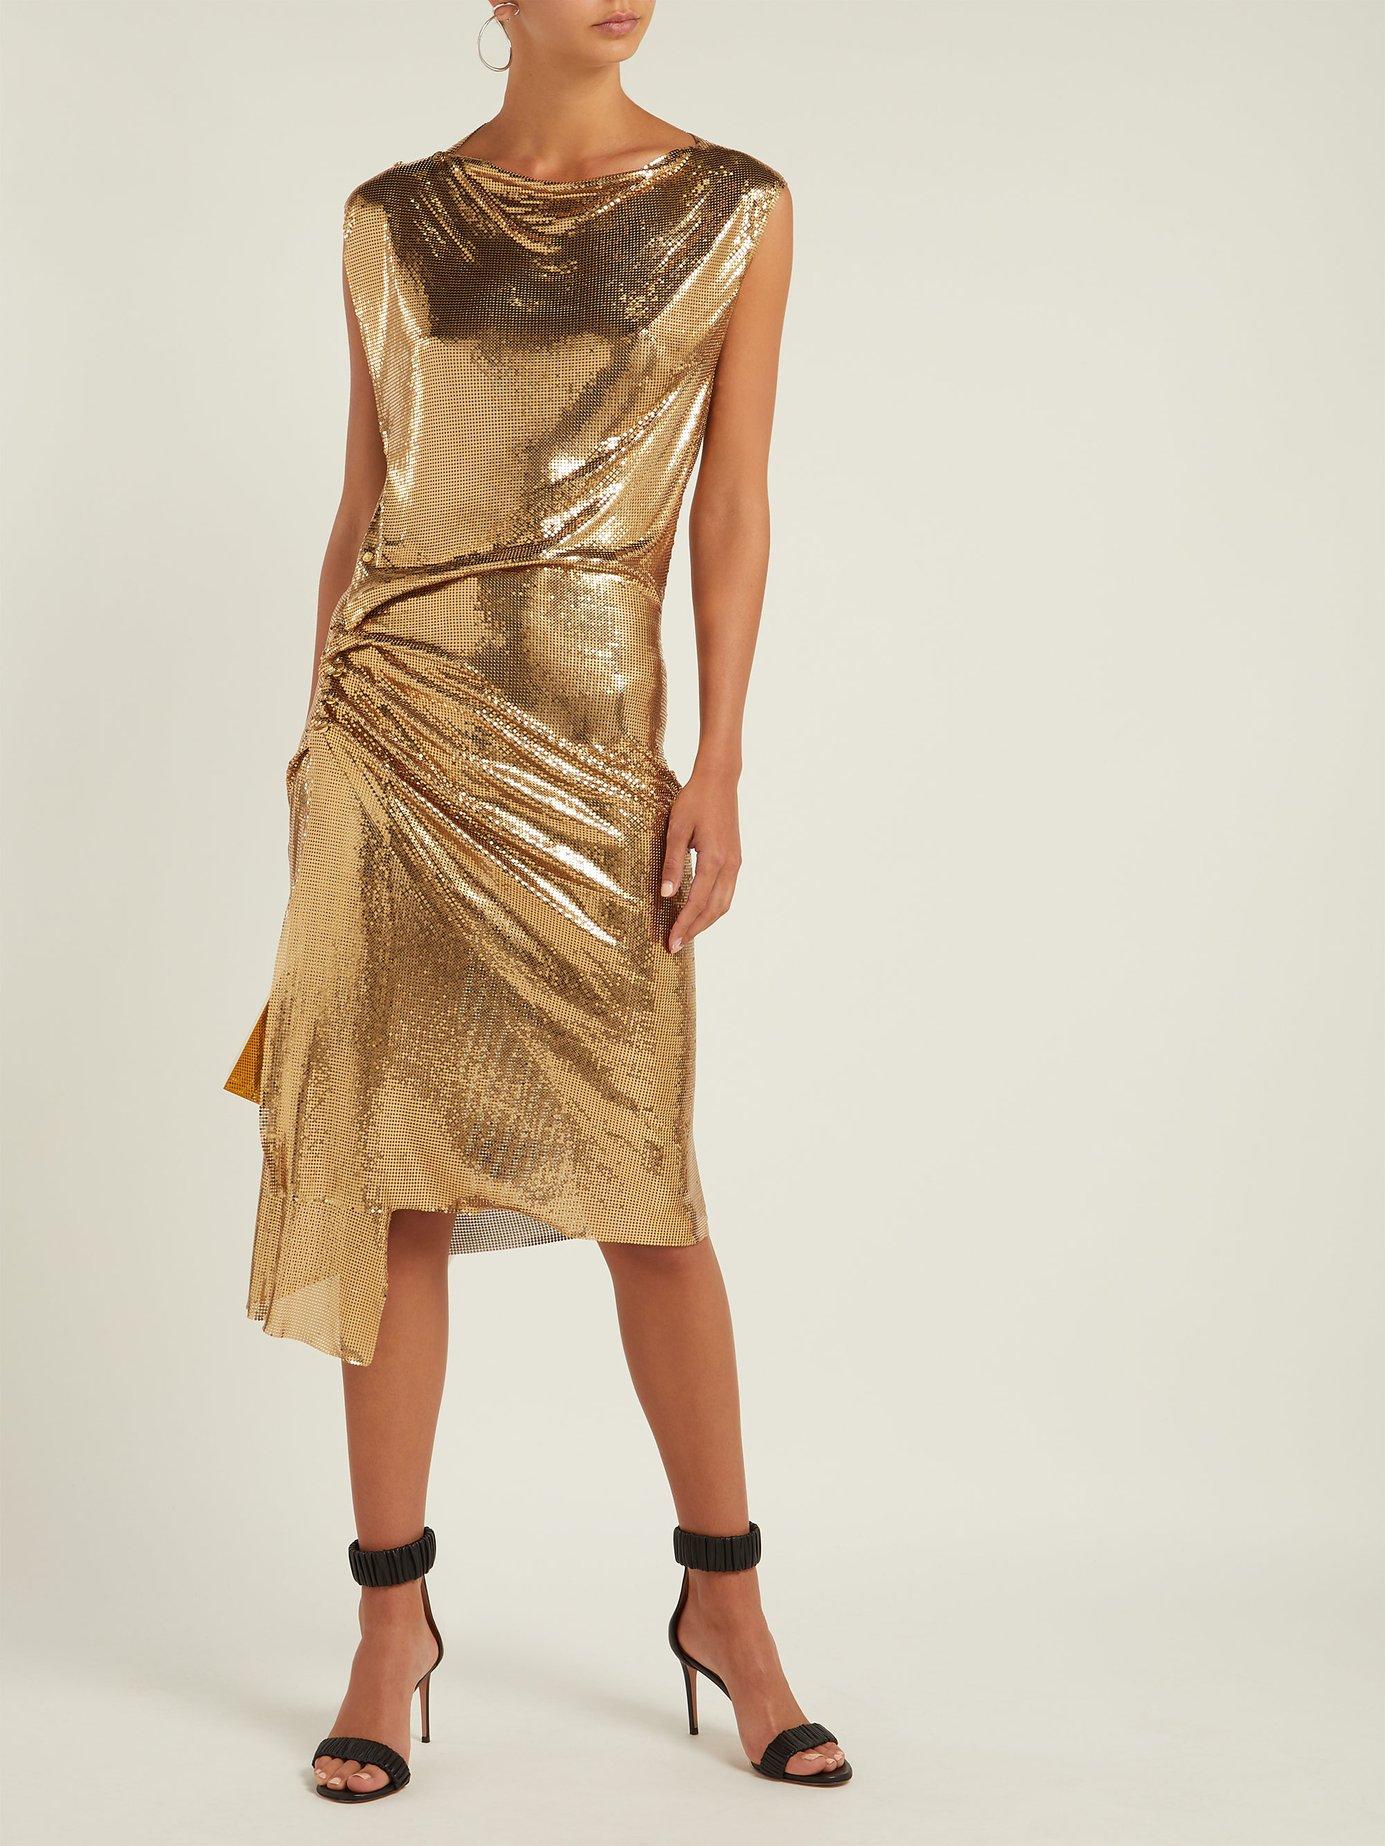 Draped metal mesh dress by Paco Rabanne